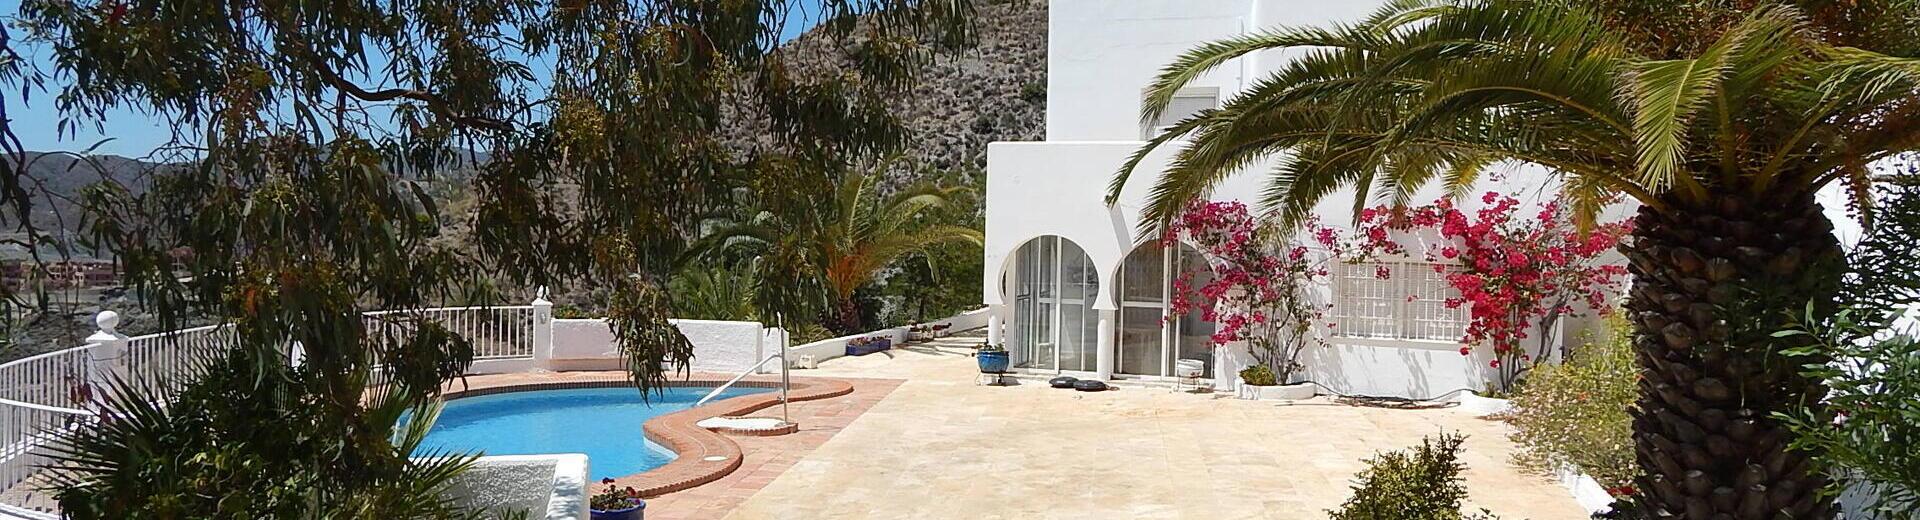 VIP7840: Villa à vendre